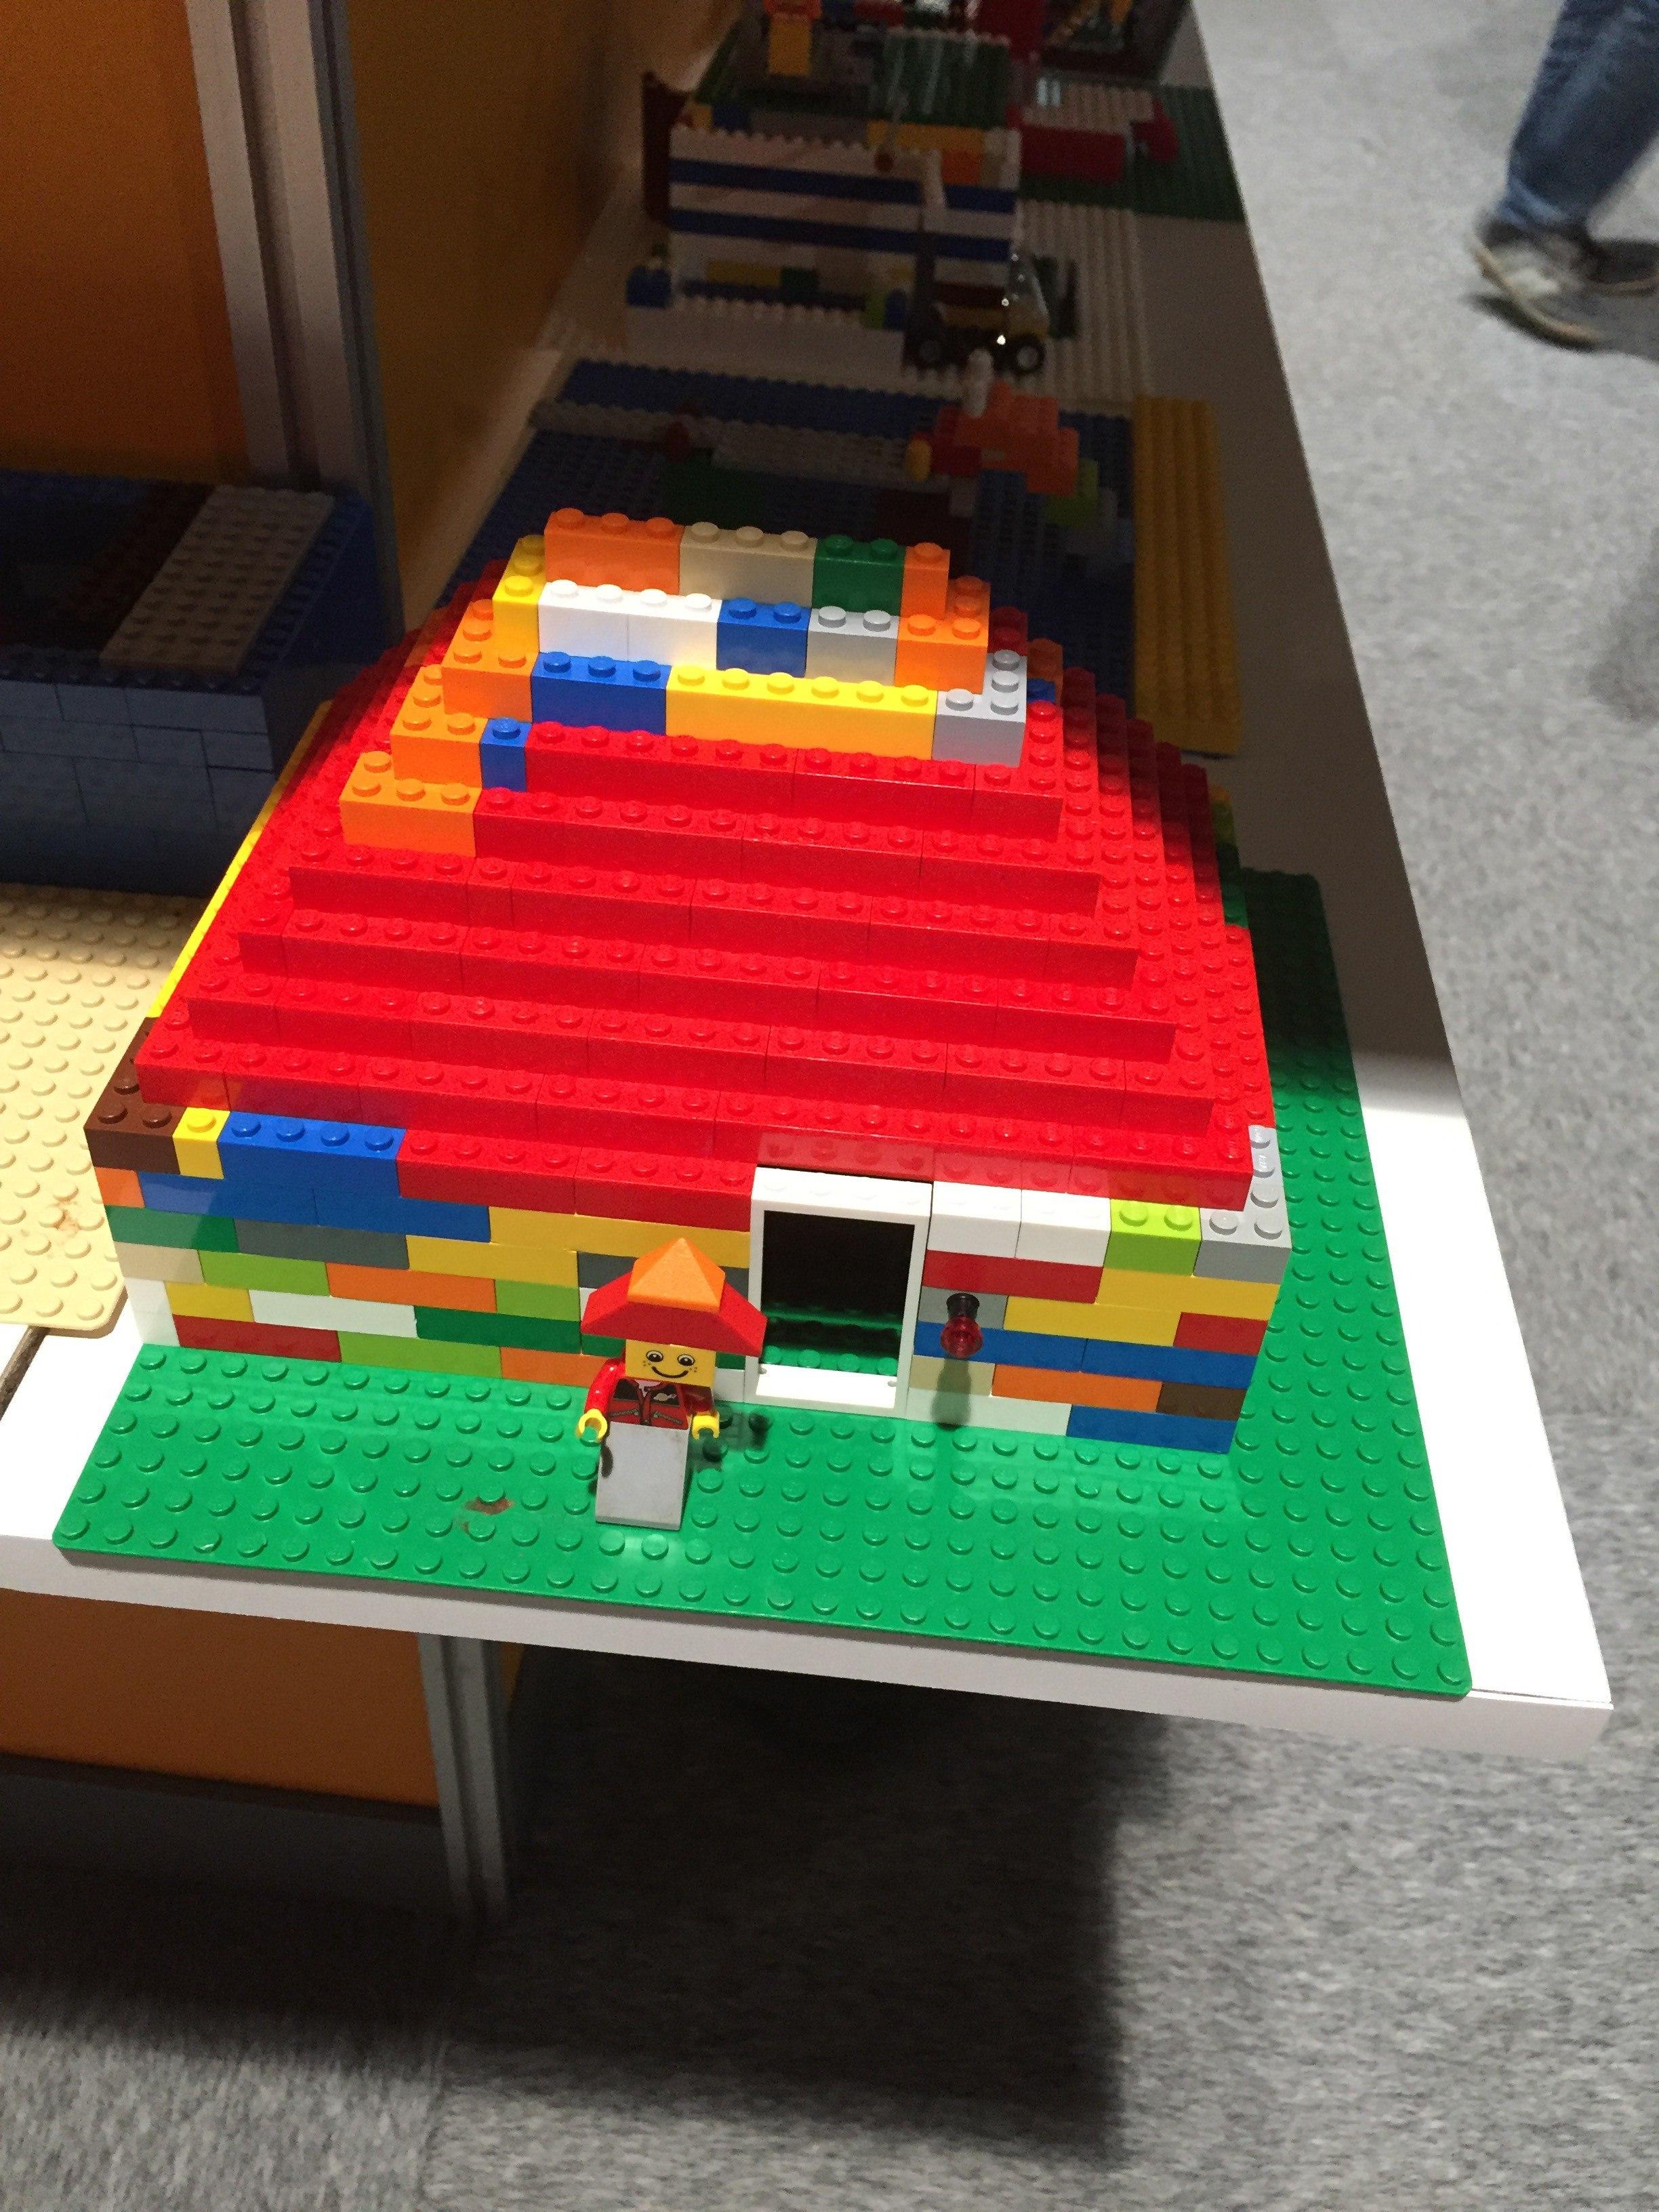 Lego World 2015 : een sfeer impressie - Trotsevaders: magazine ...